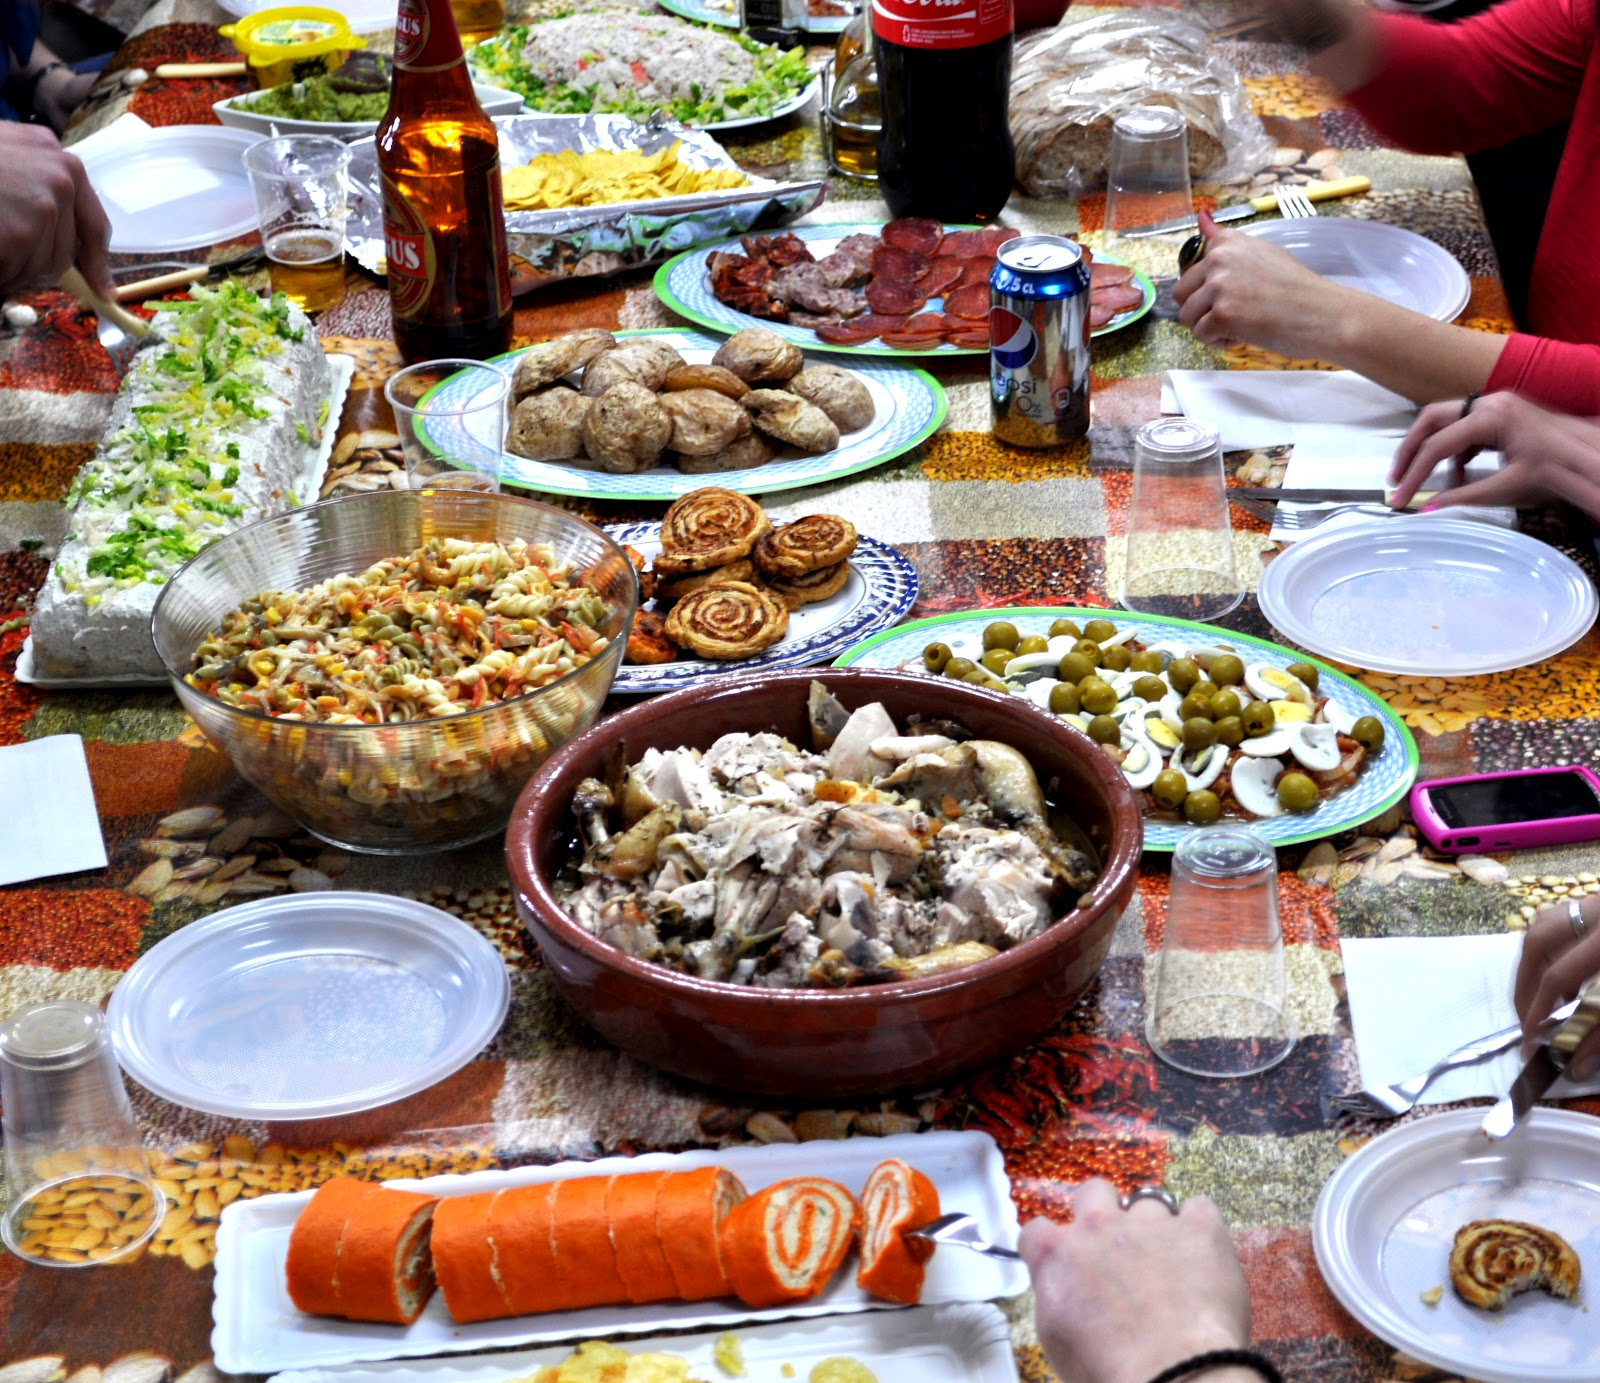 las recetas de mi comida de cumplea os On comida cumpleanos